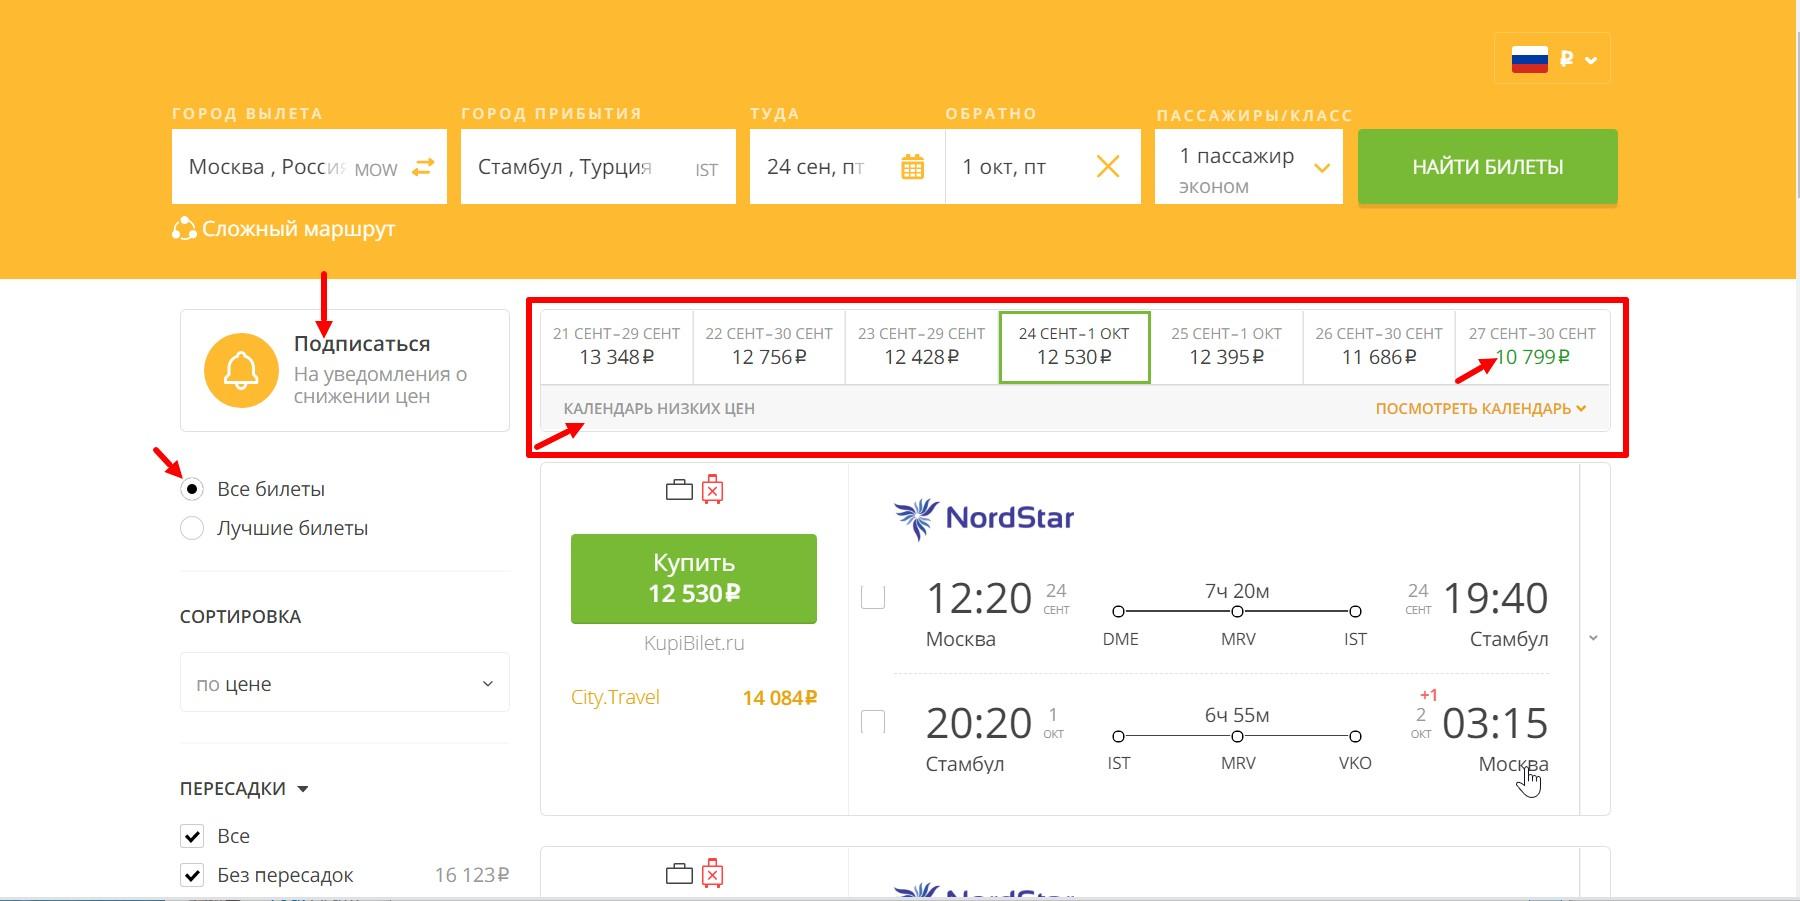 Пример поиска авиабилета из Москвы в Стамбул с календарем цен